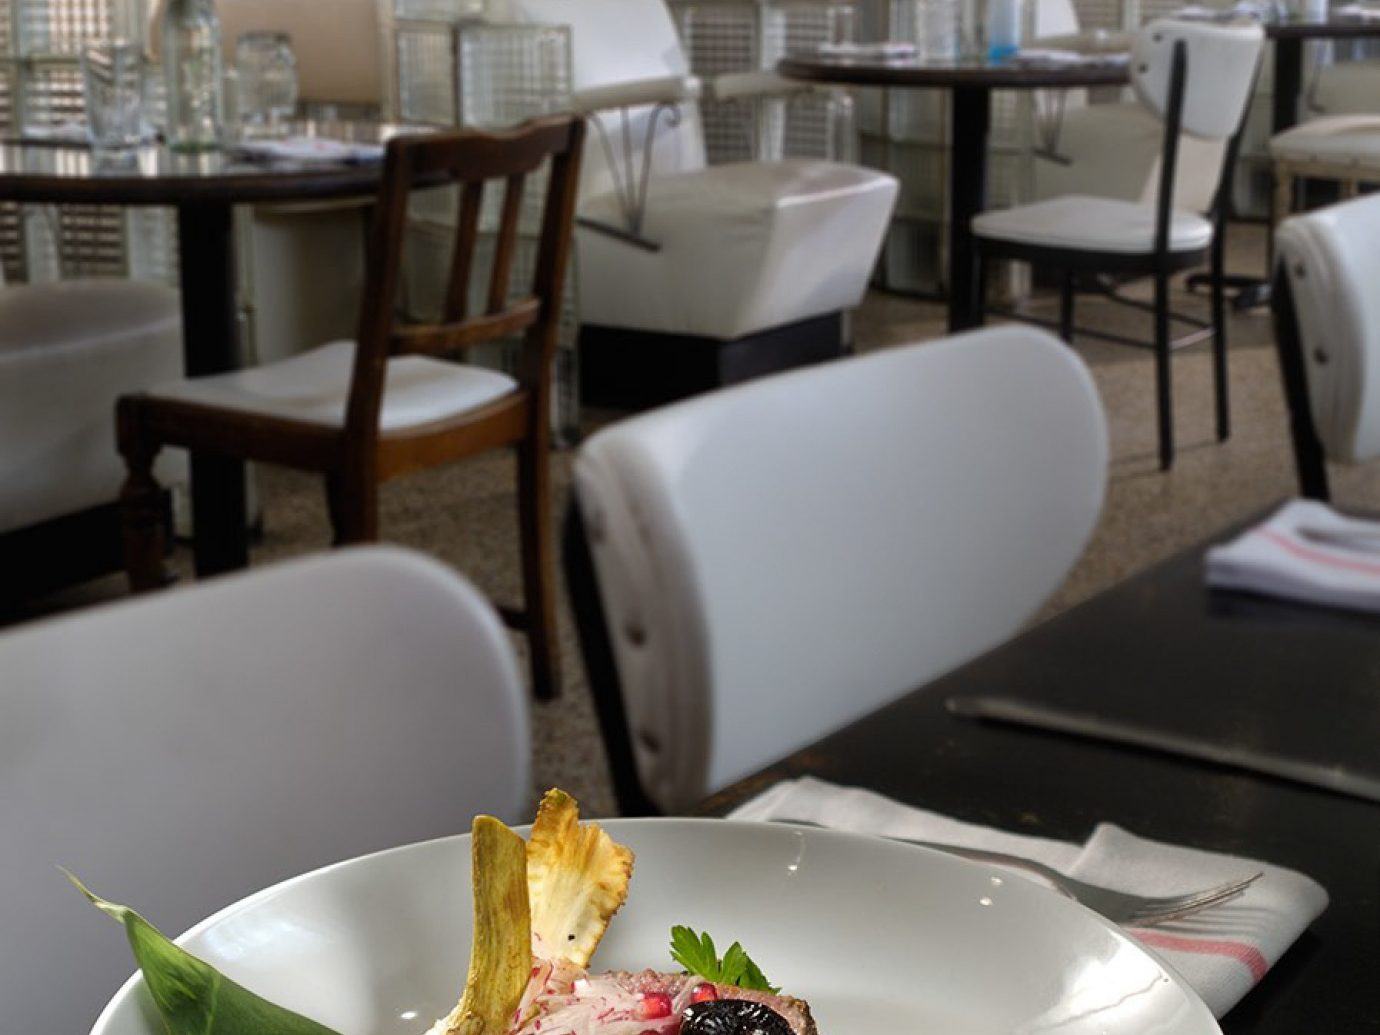 Food + Drink plate table food indoor brunch meal cuisine dish restaurant breakfast dining table